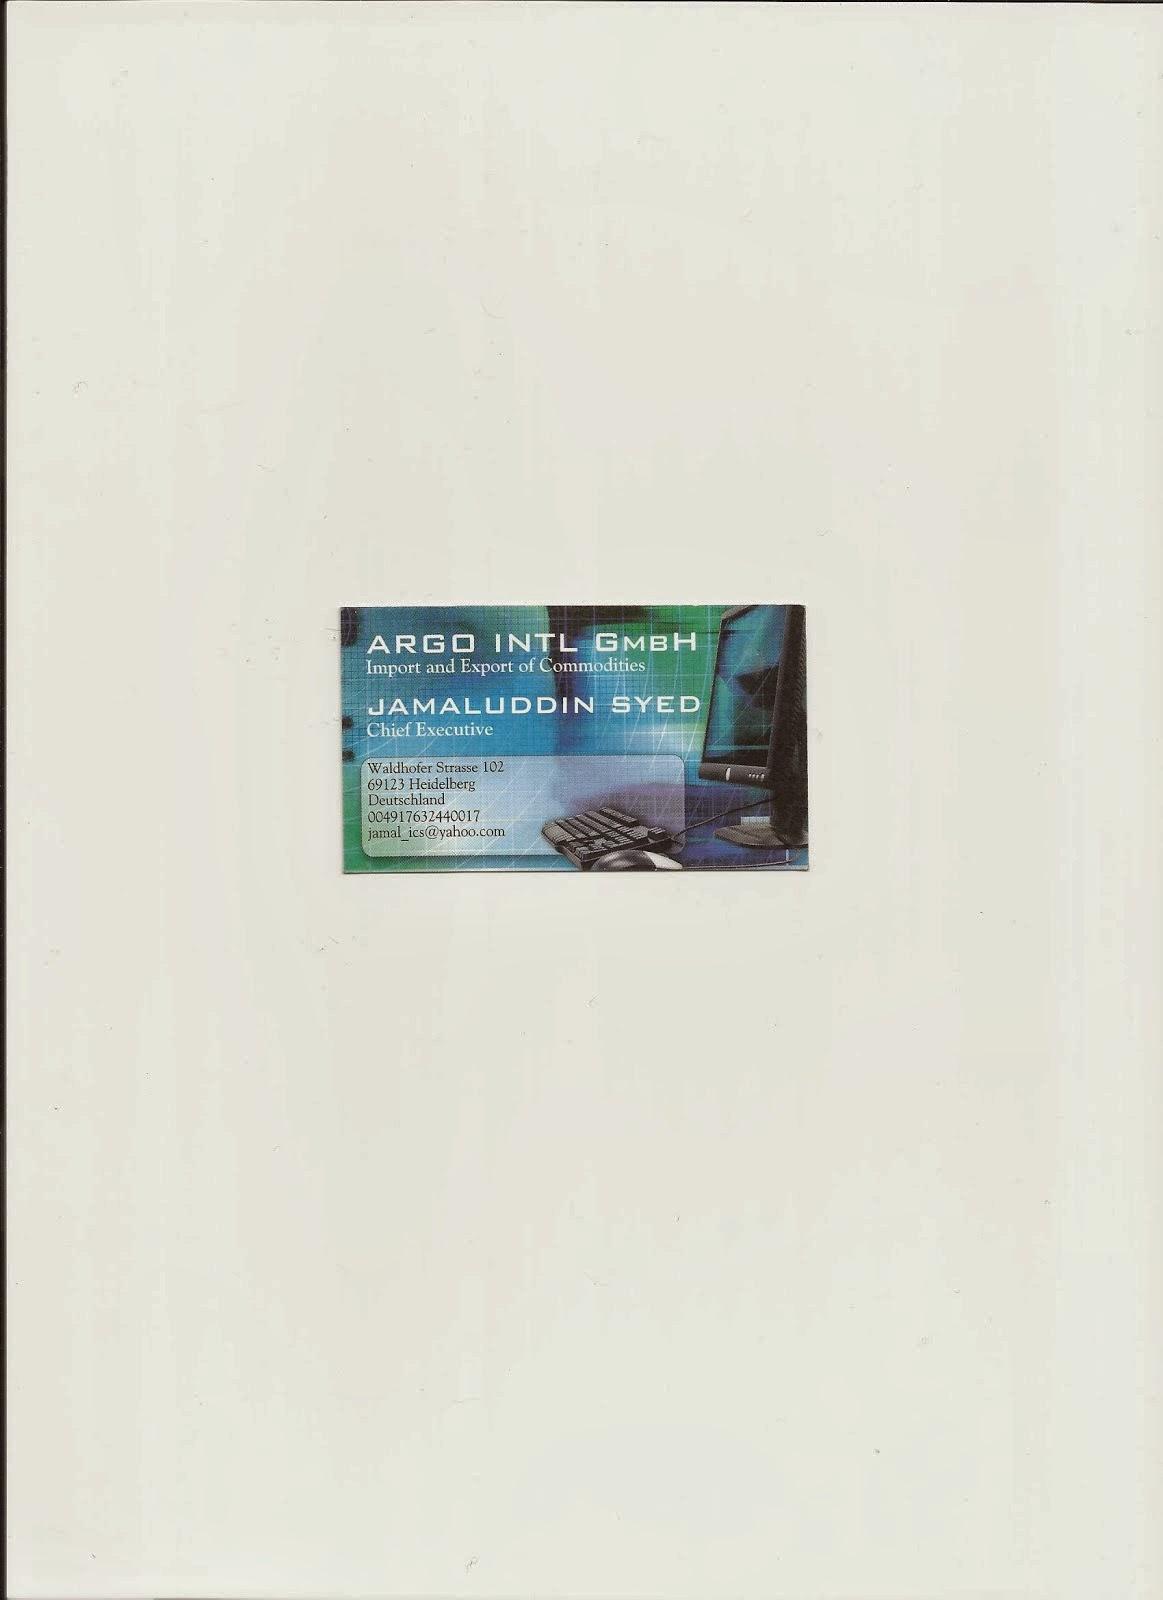 SYED JAMALUDDIN CARD